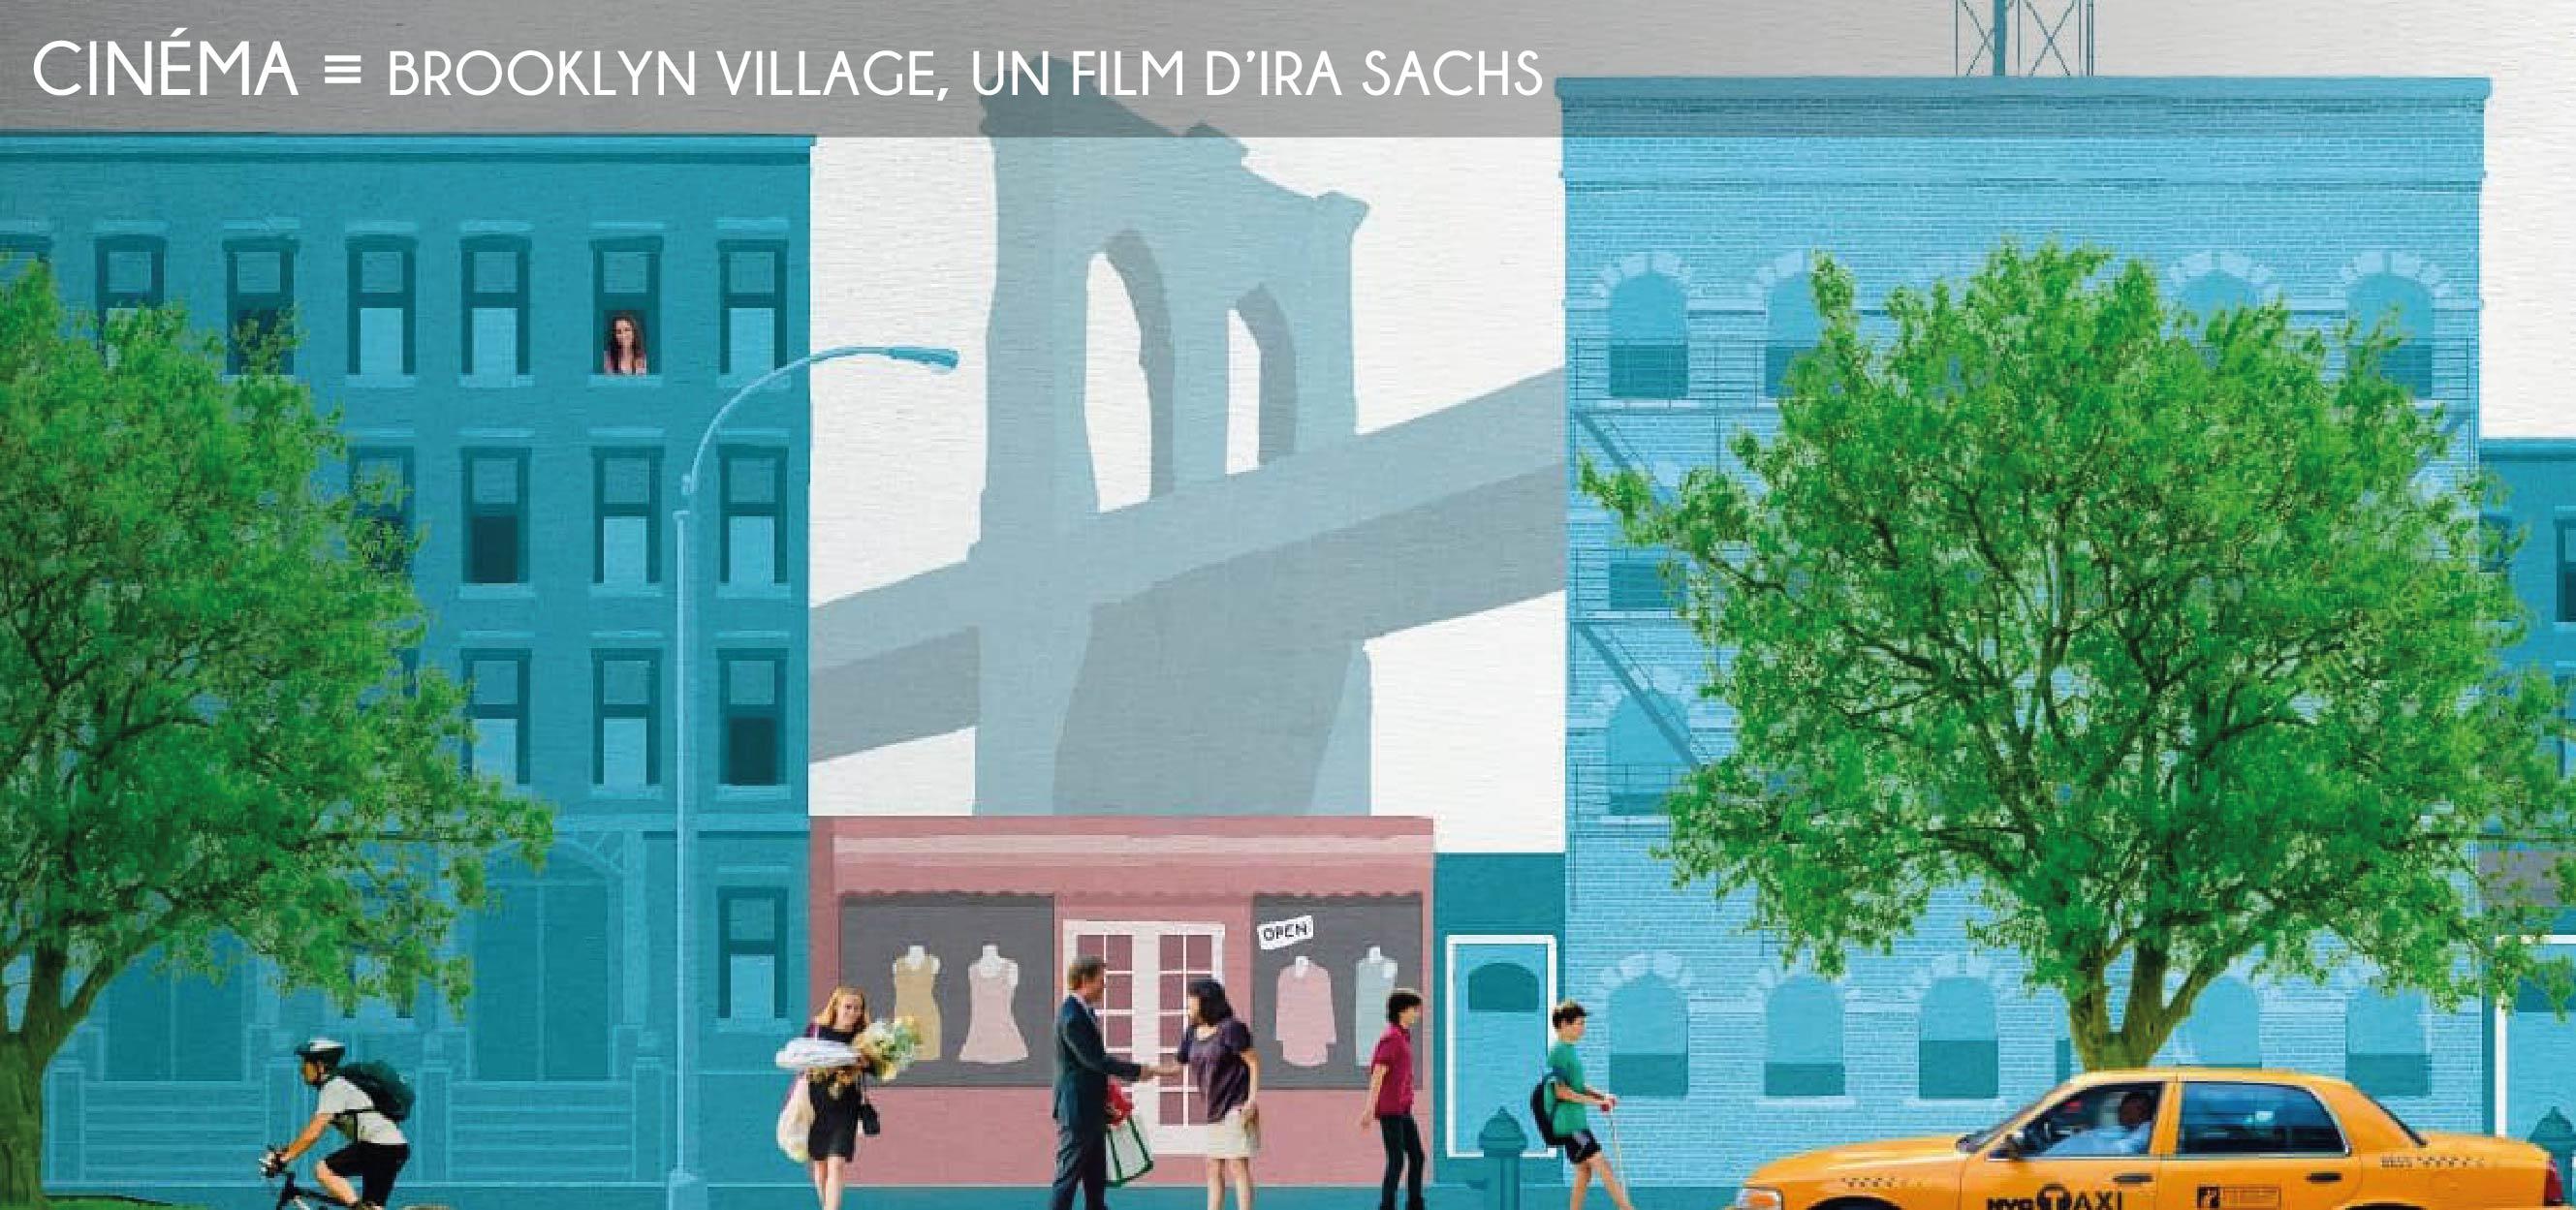 brooklyn village, brooklyn, manhattan, new york, ira sachs, gentrification, adolescence, greg kinnear, jennifer ehle, paulina garcia